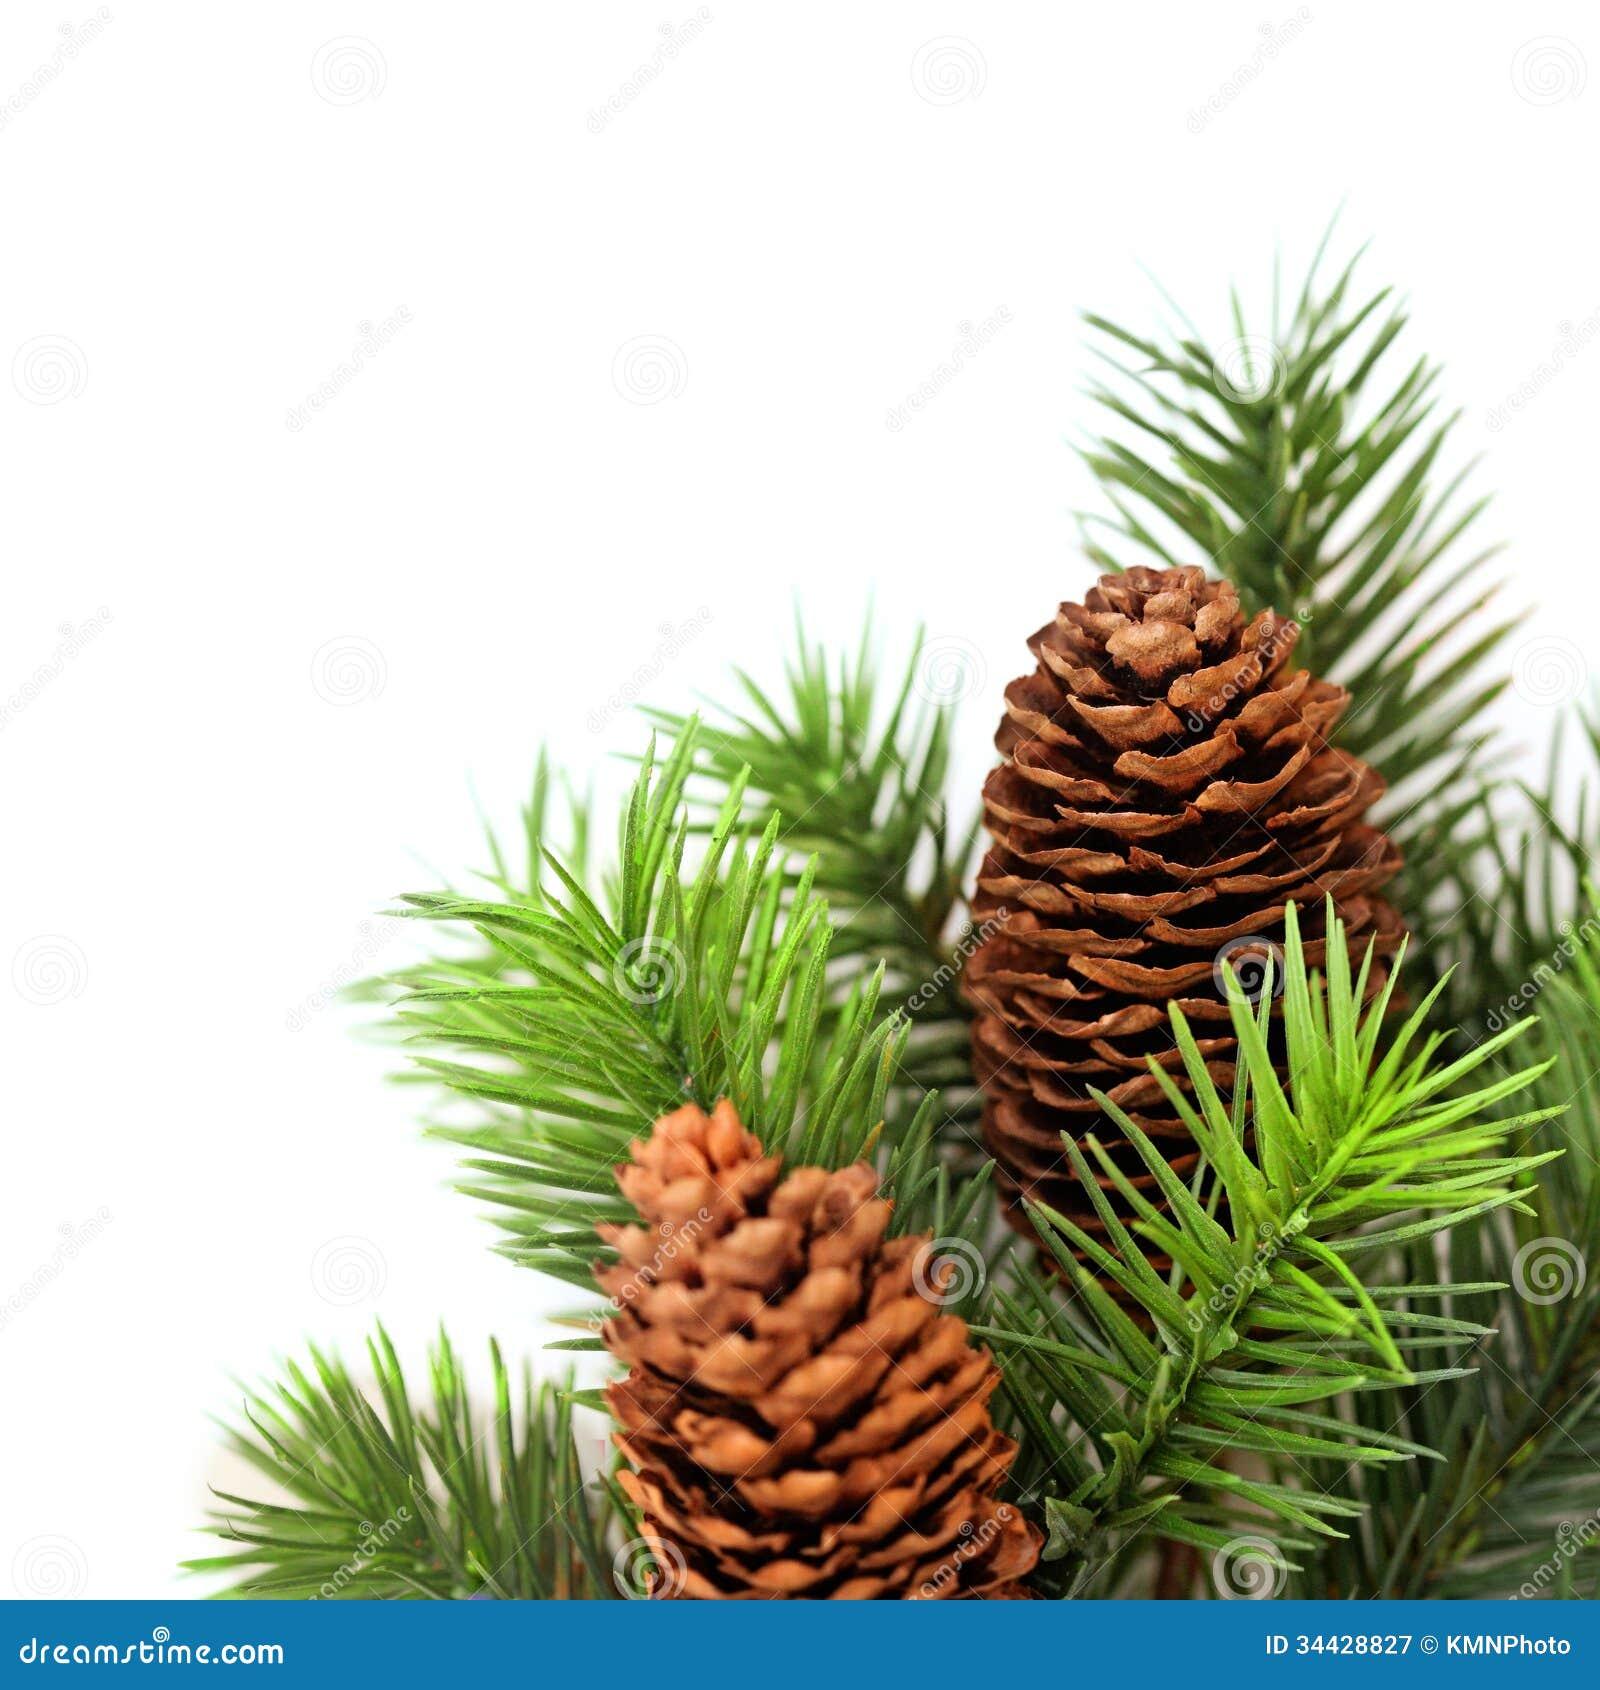 Christmas tree branches stock image. Image of plant, xmas - 34428827